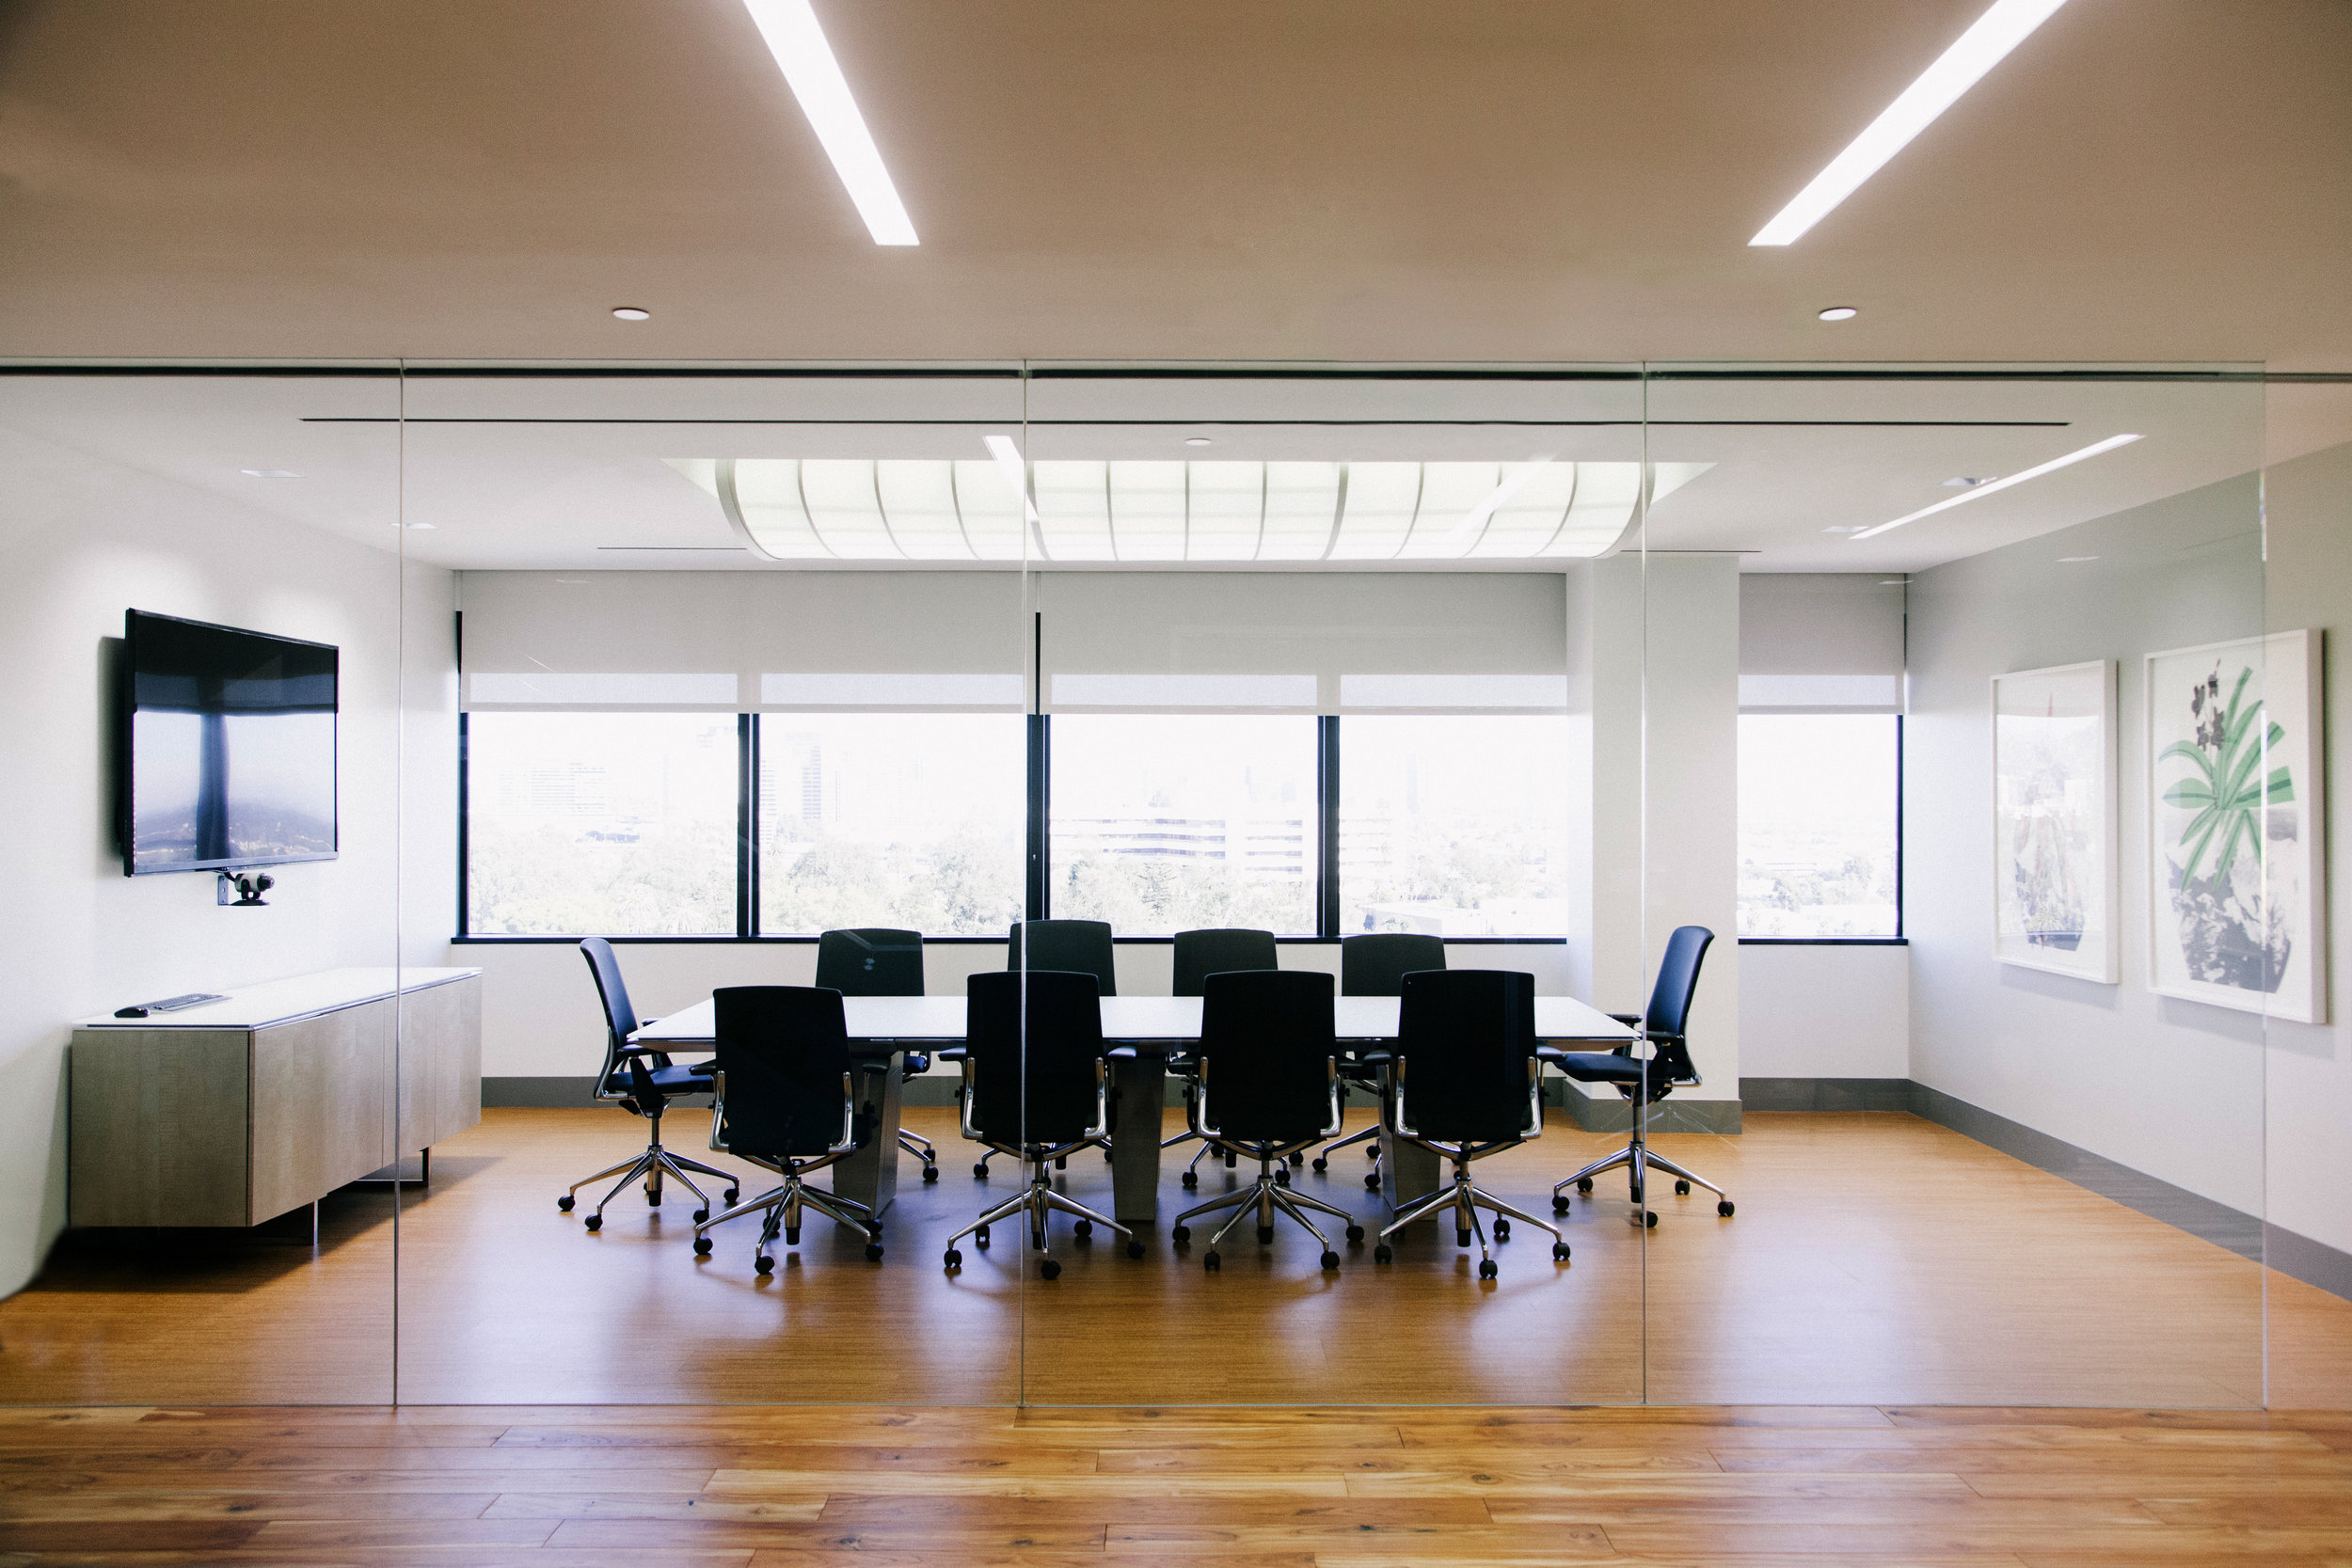 S.E.A.-Studio-Environmental-Architecture-David-Hertz-FAIA-First-Pacific-Advisors-Los-Angeles-tenant-improvement-sustainable-regenerative-restorative-green-design-office-sleek-modern-interior-Westside-commercial-building-professional-workplace-4.jpg